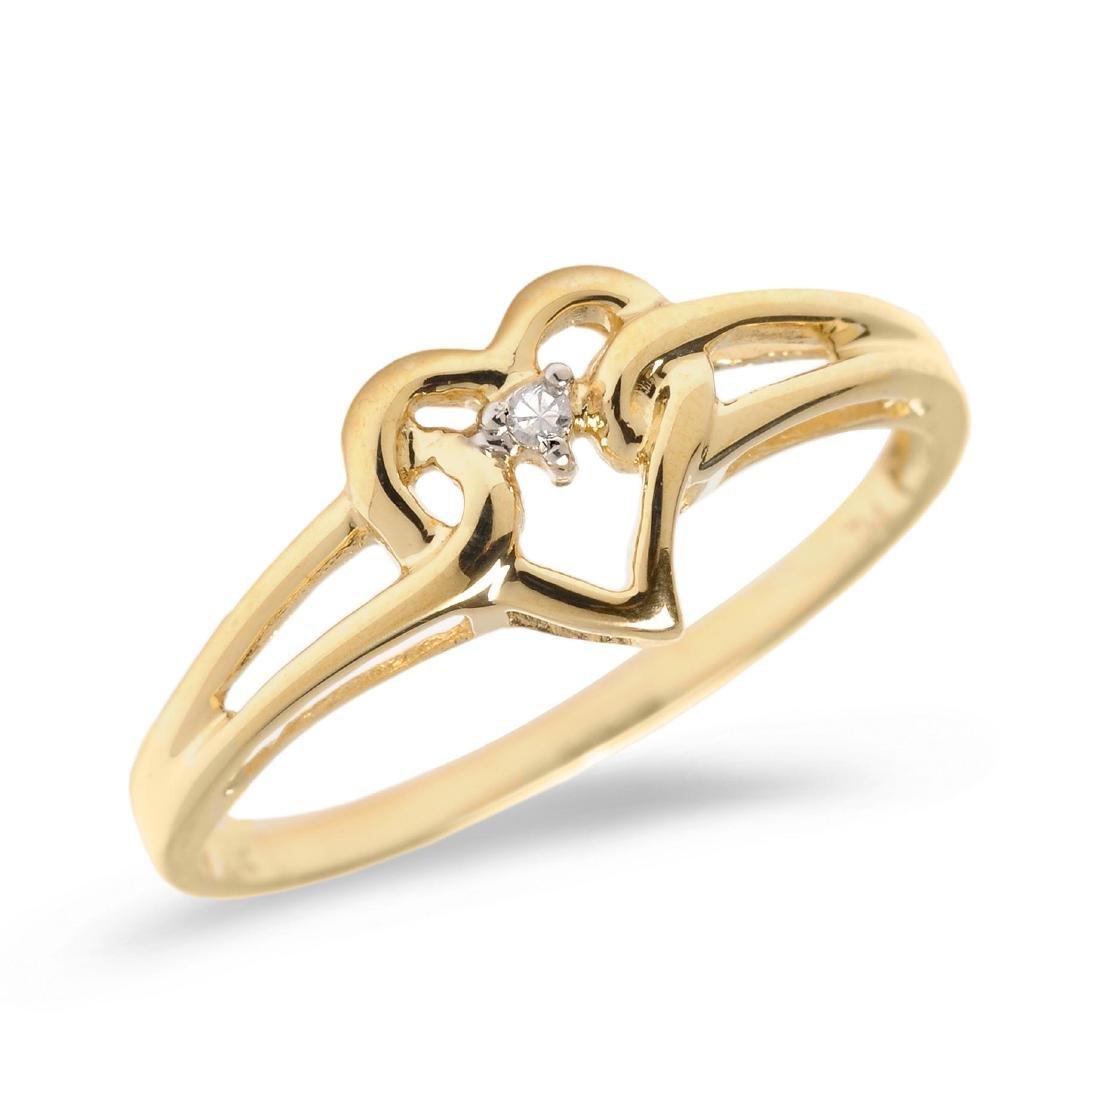 Certified 14K Yellow Gold Diamond Heart Ring 0.01 CTW